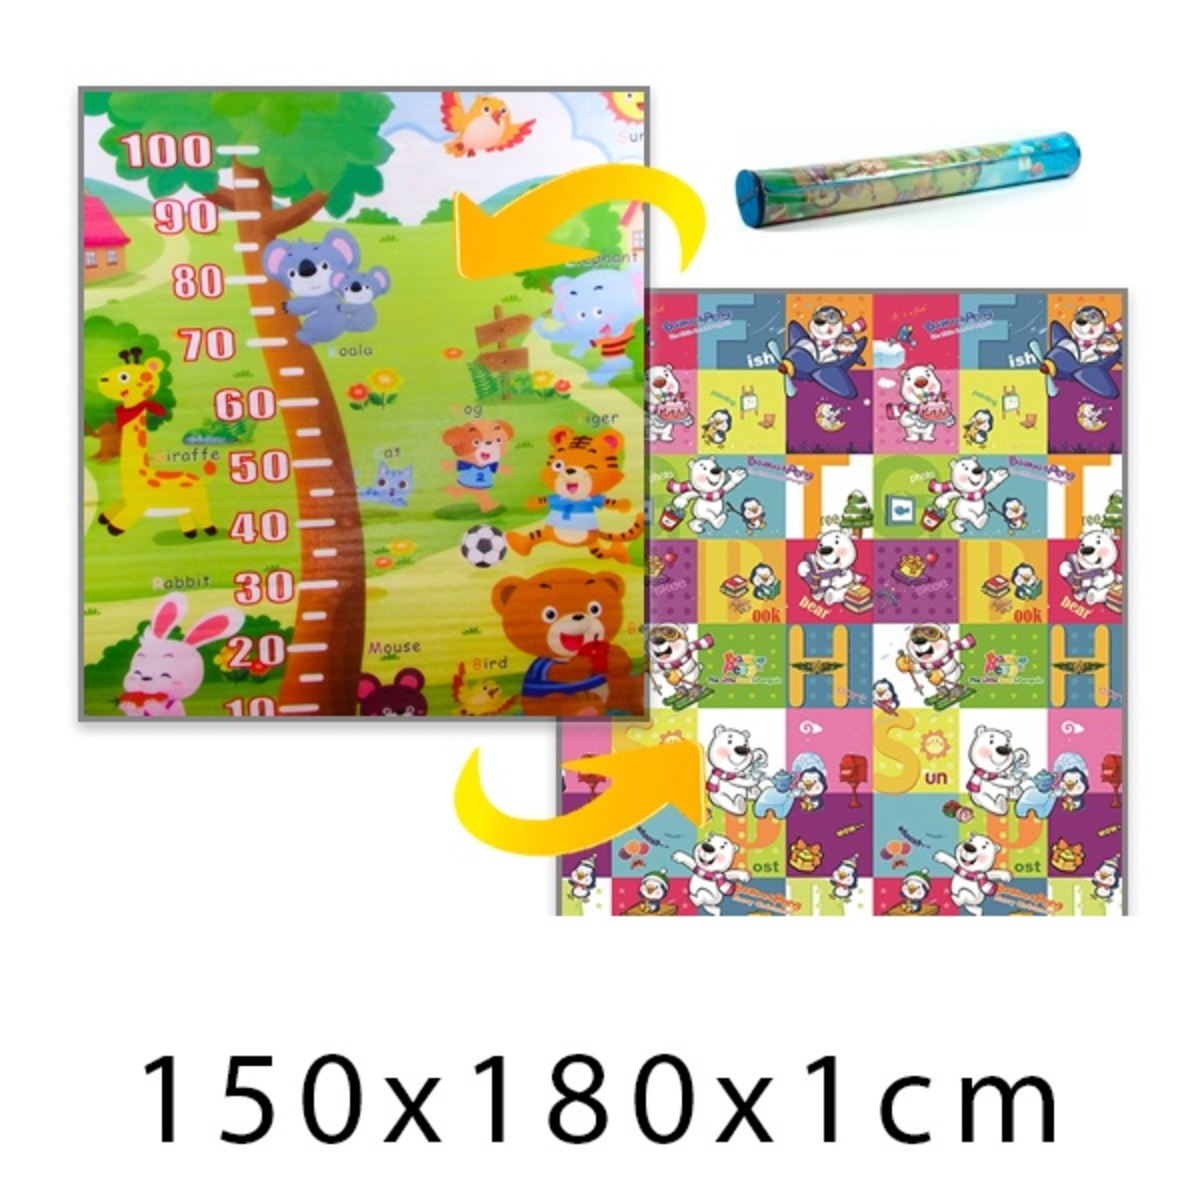 Detský penový koberec - piknik + medvedíky